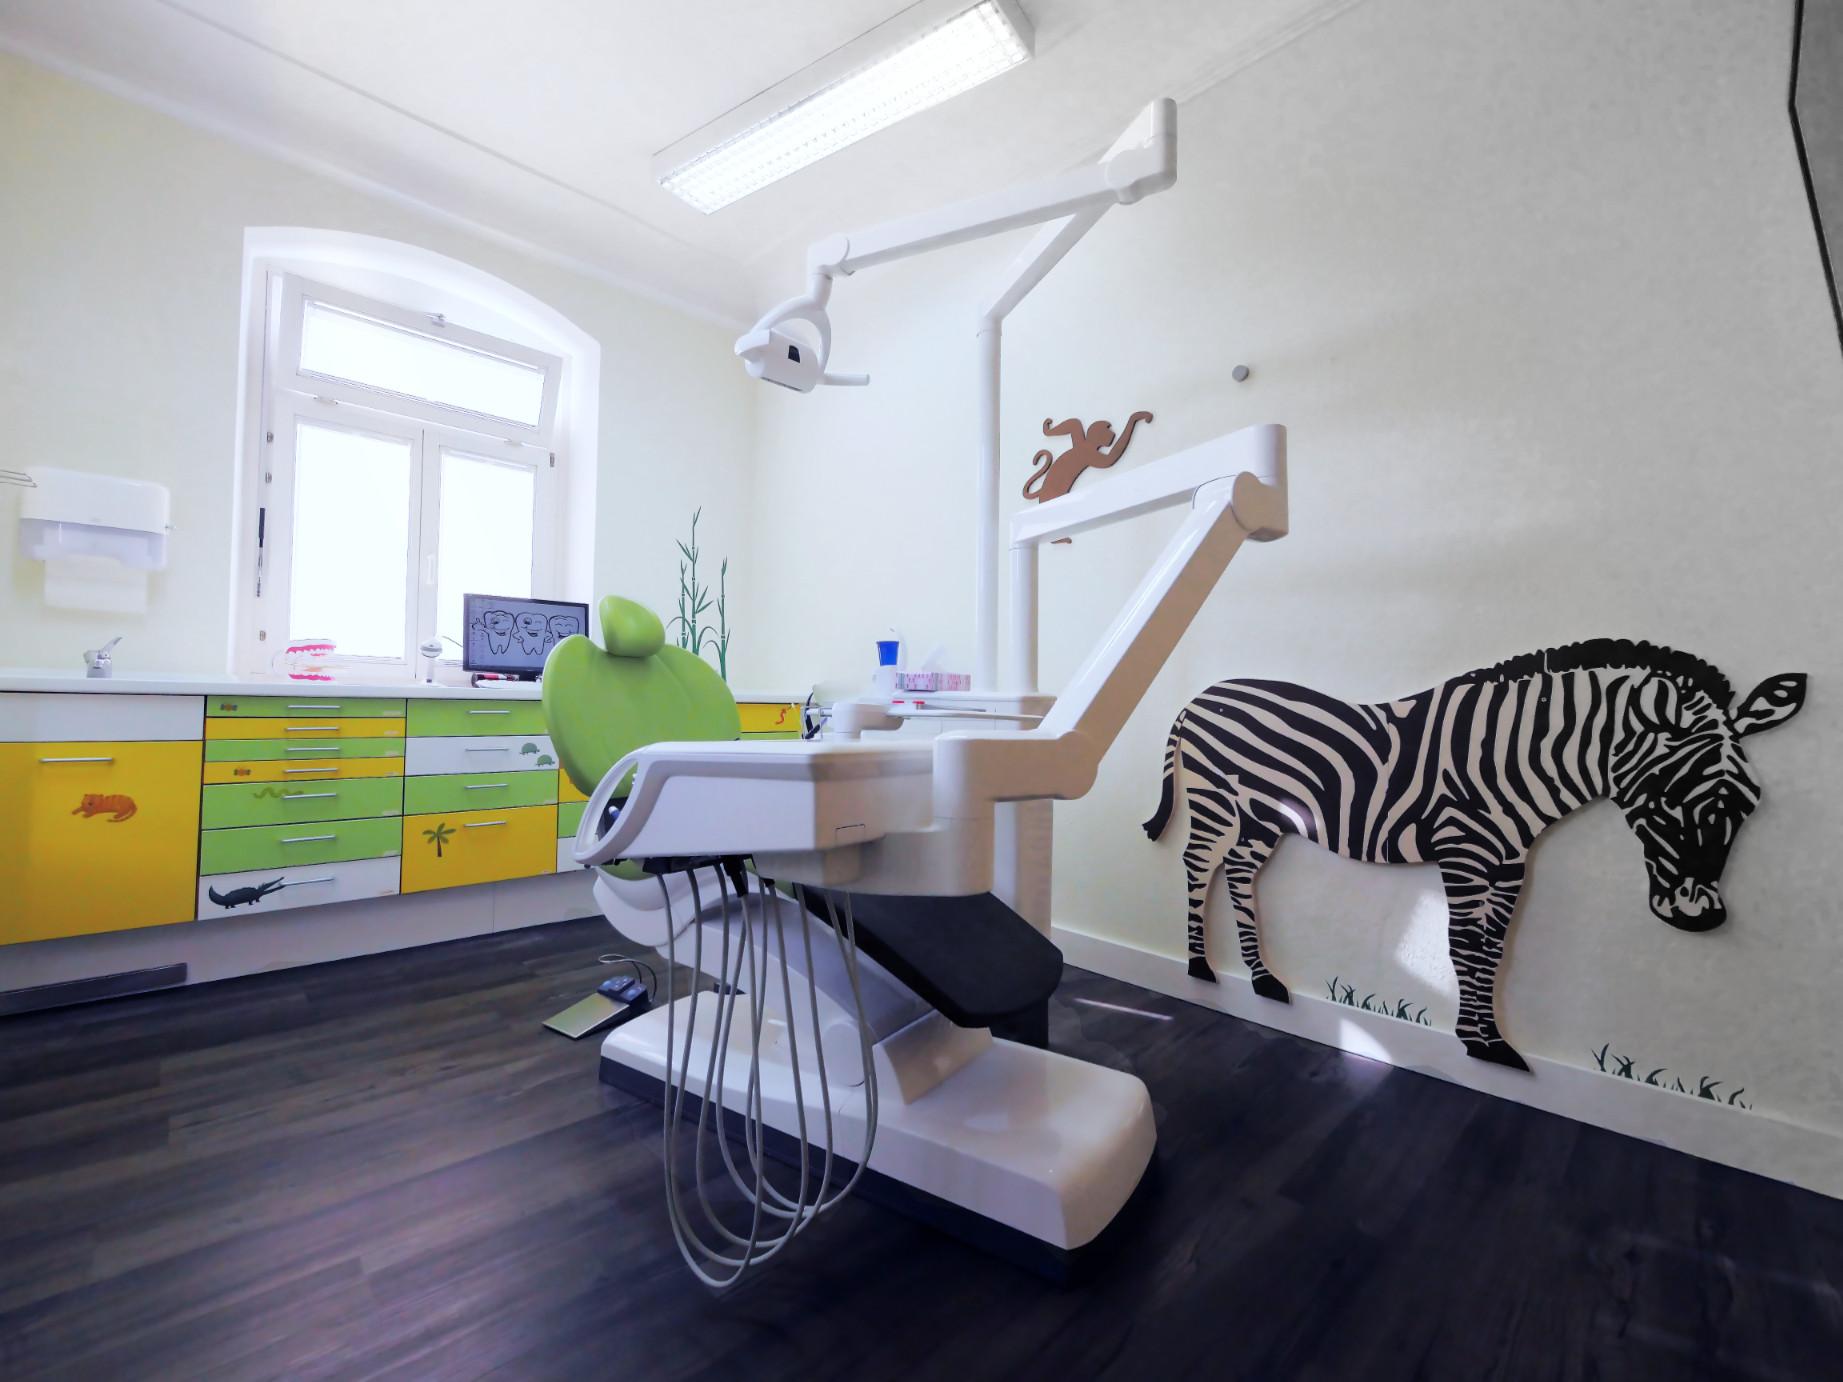 Kinderbehandlungszimmer – Die Zahnärzte im Odenheimer Hof – Leingarten (Heilbronn) - Dr. Alexander Mitsch M.Sc. & Dr. Jan Felix Hartl M.Sc.